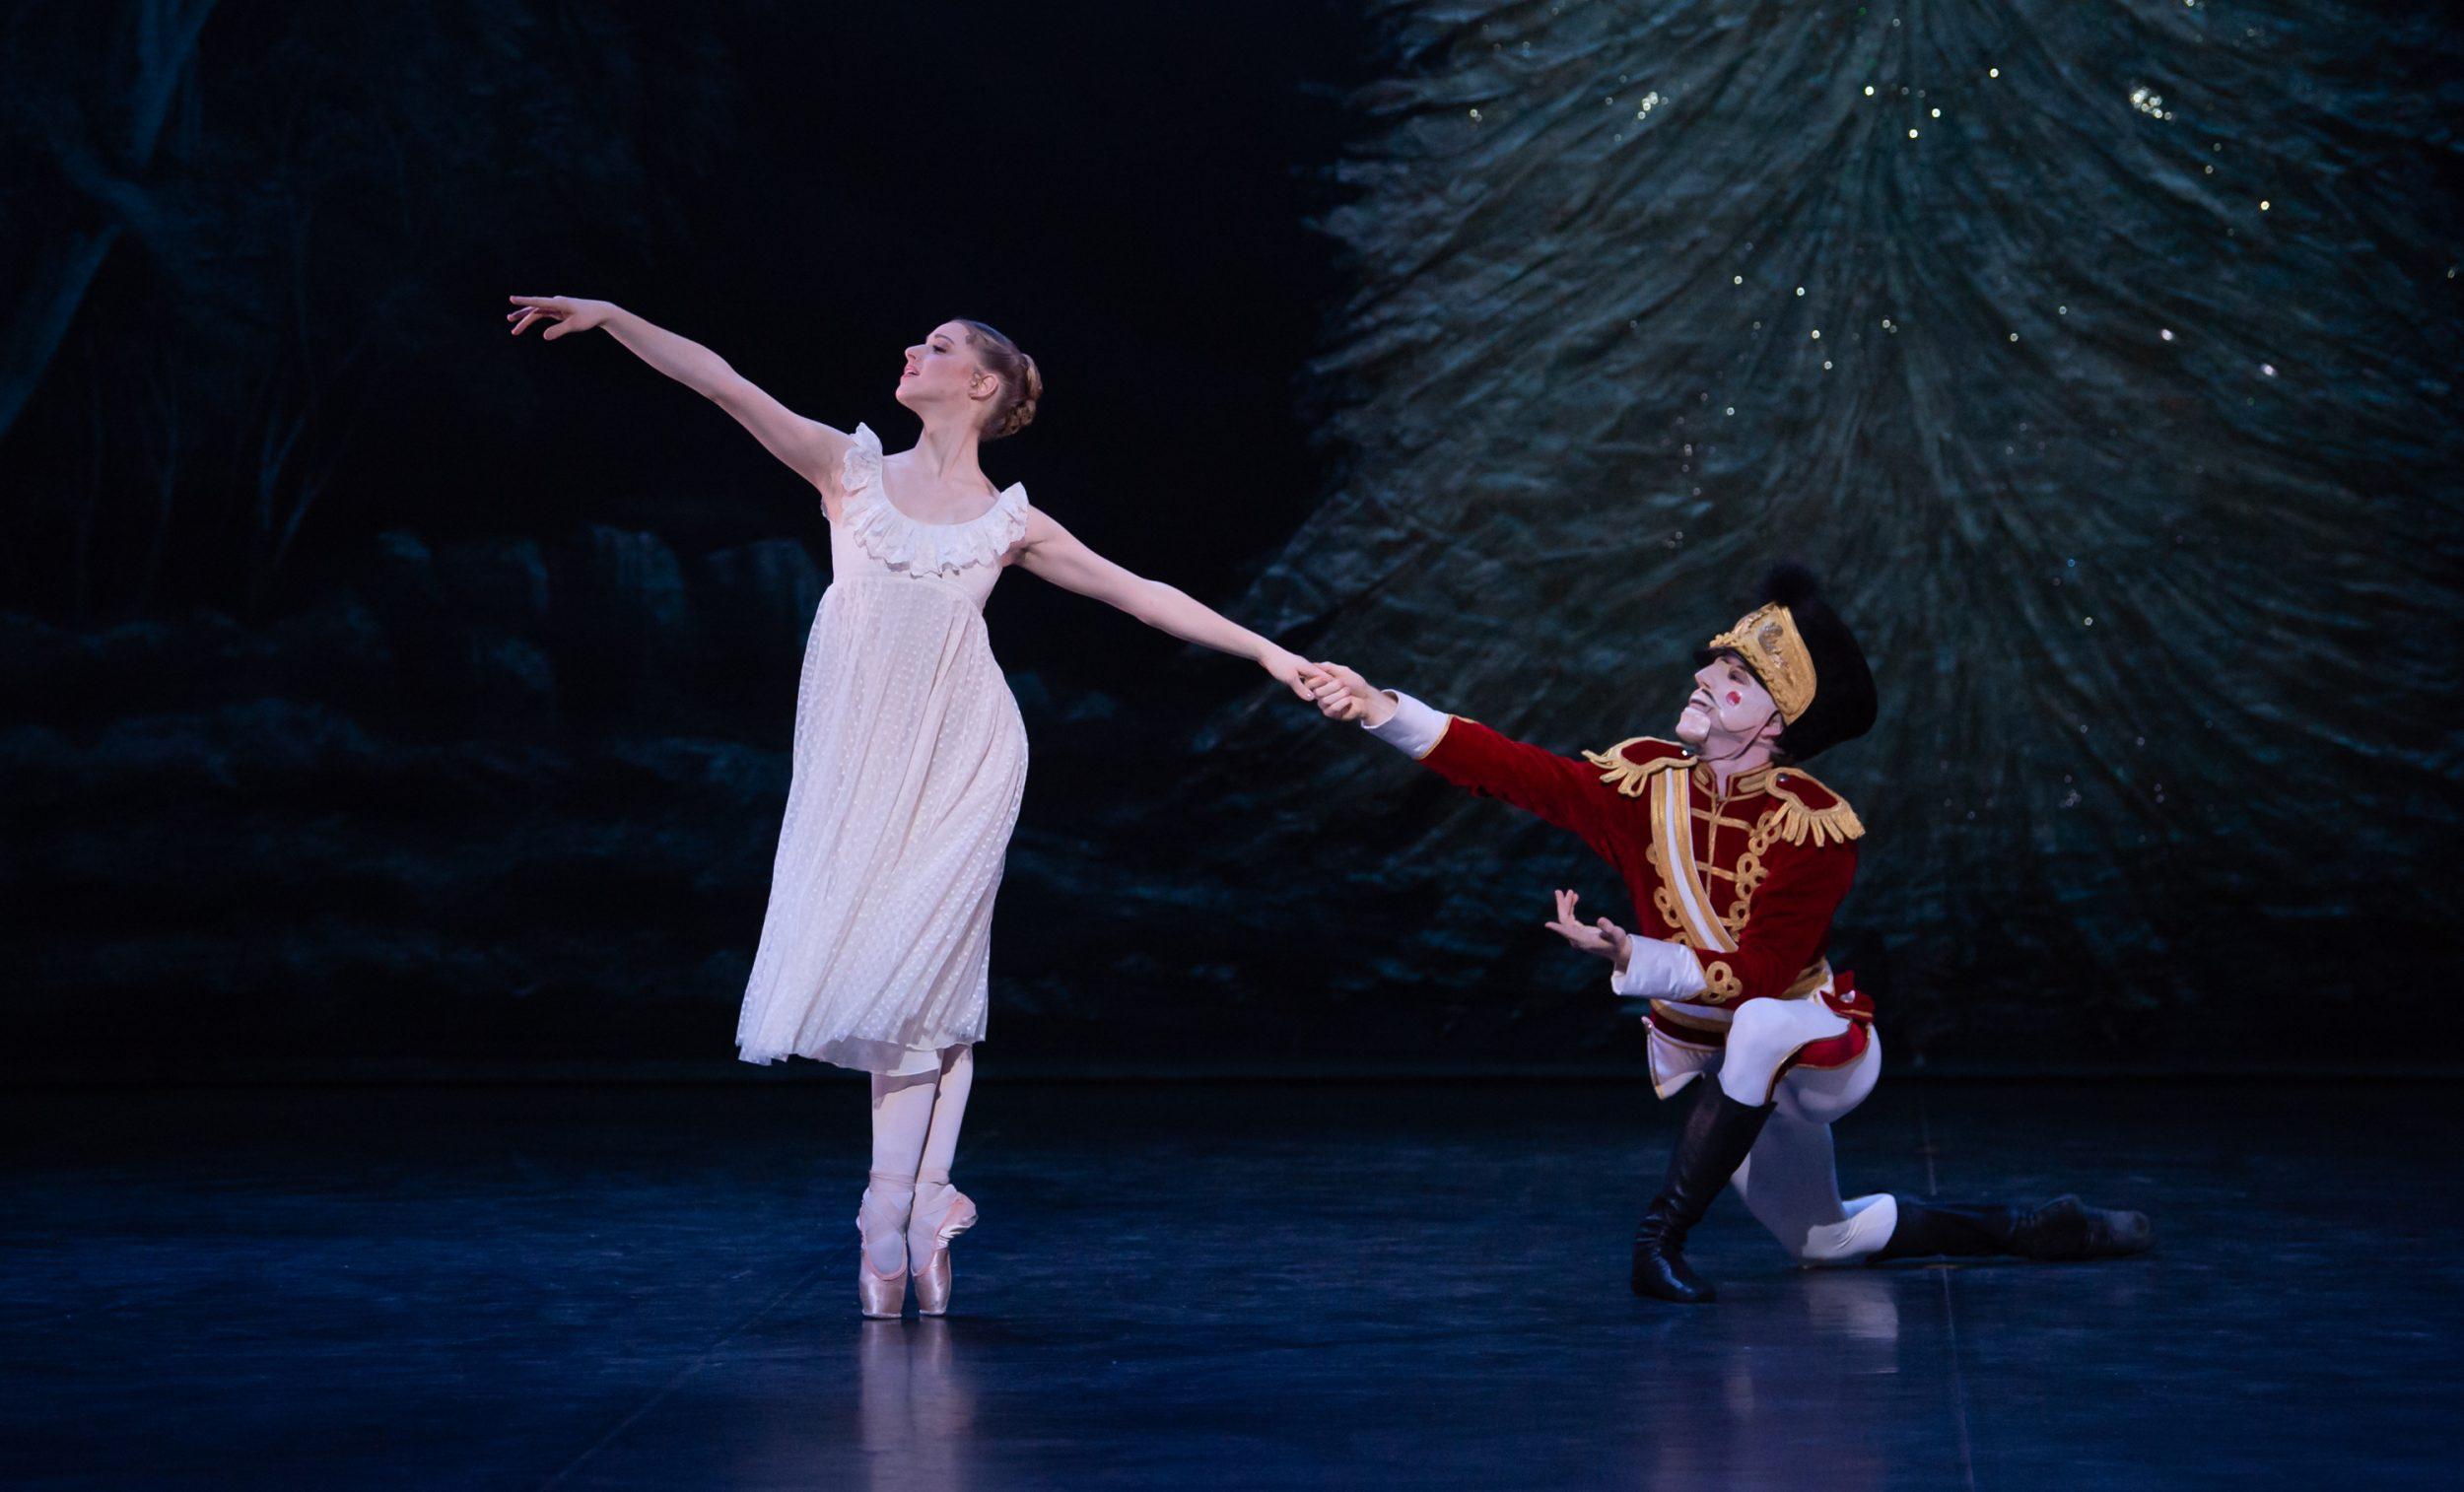 English National Ballet Nutcracker Delights